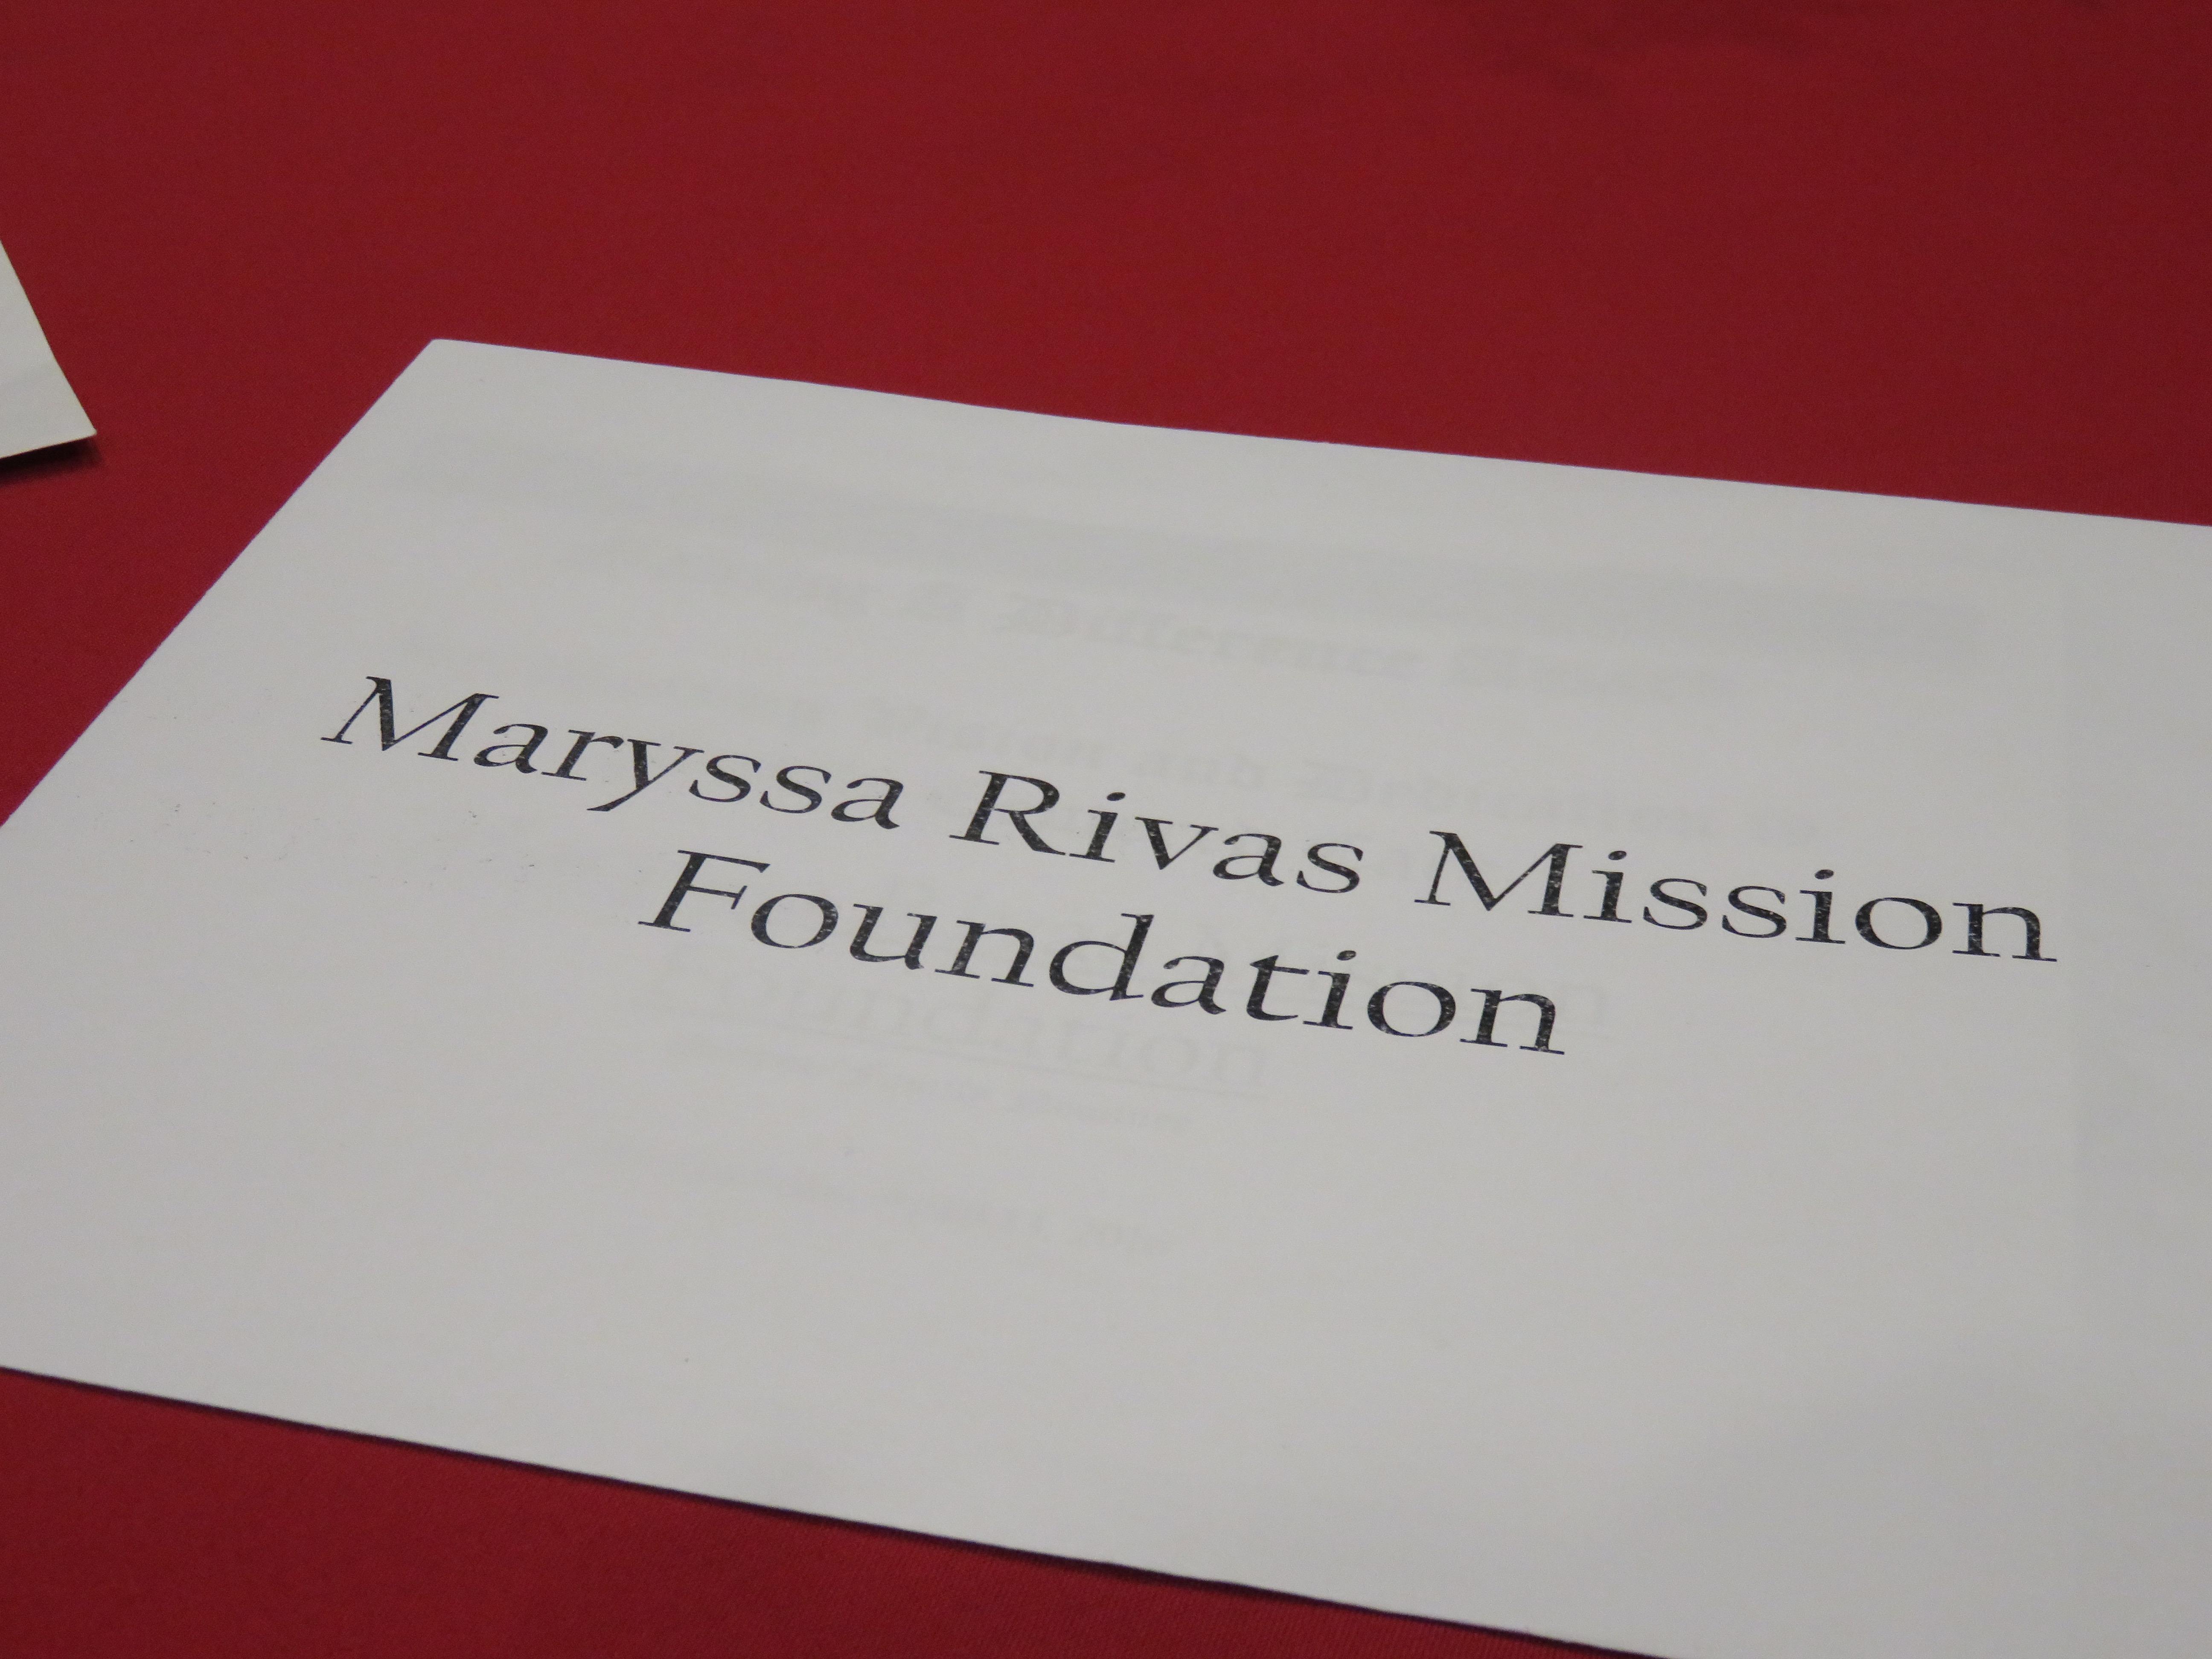 Maryssa's Mission Nominations